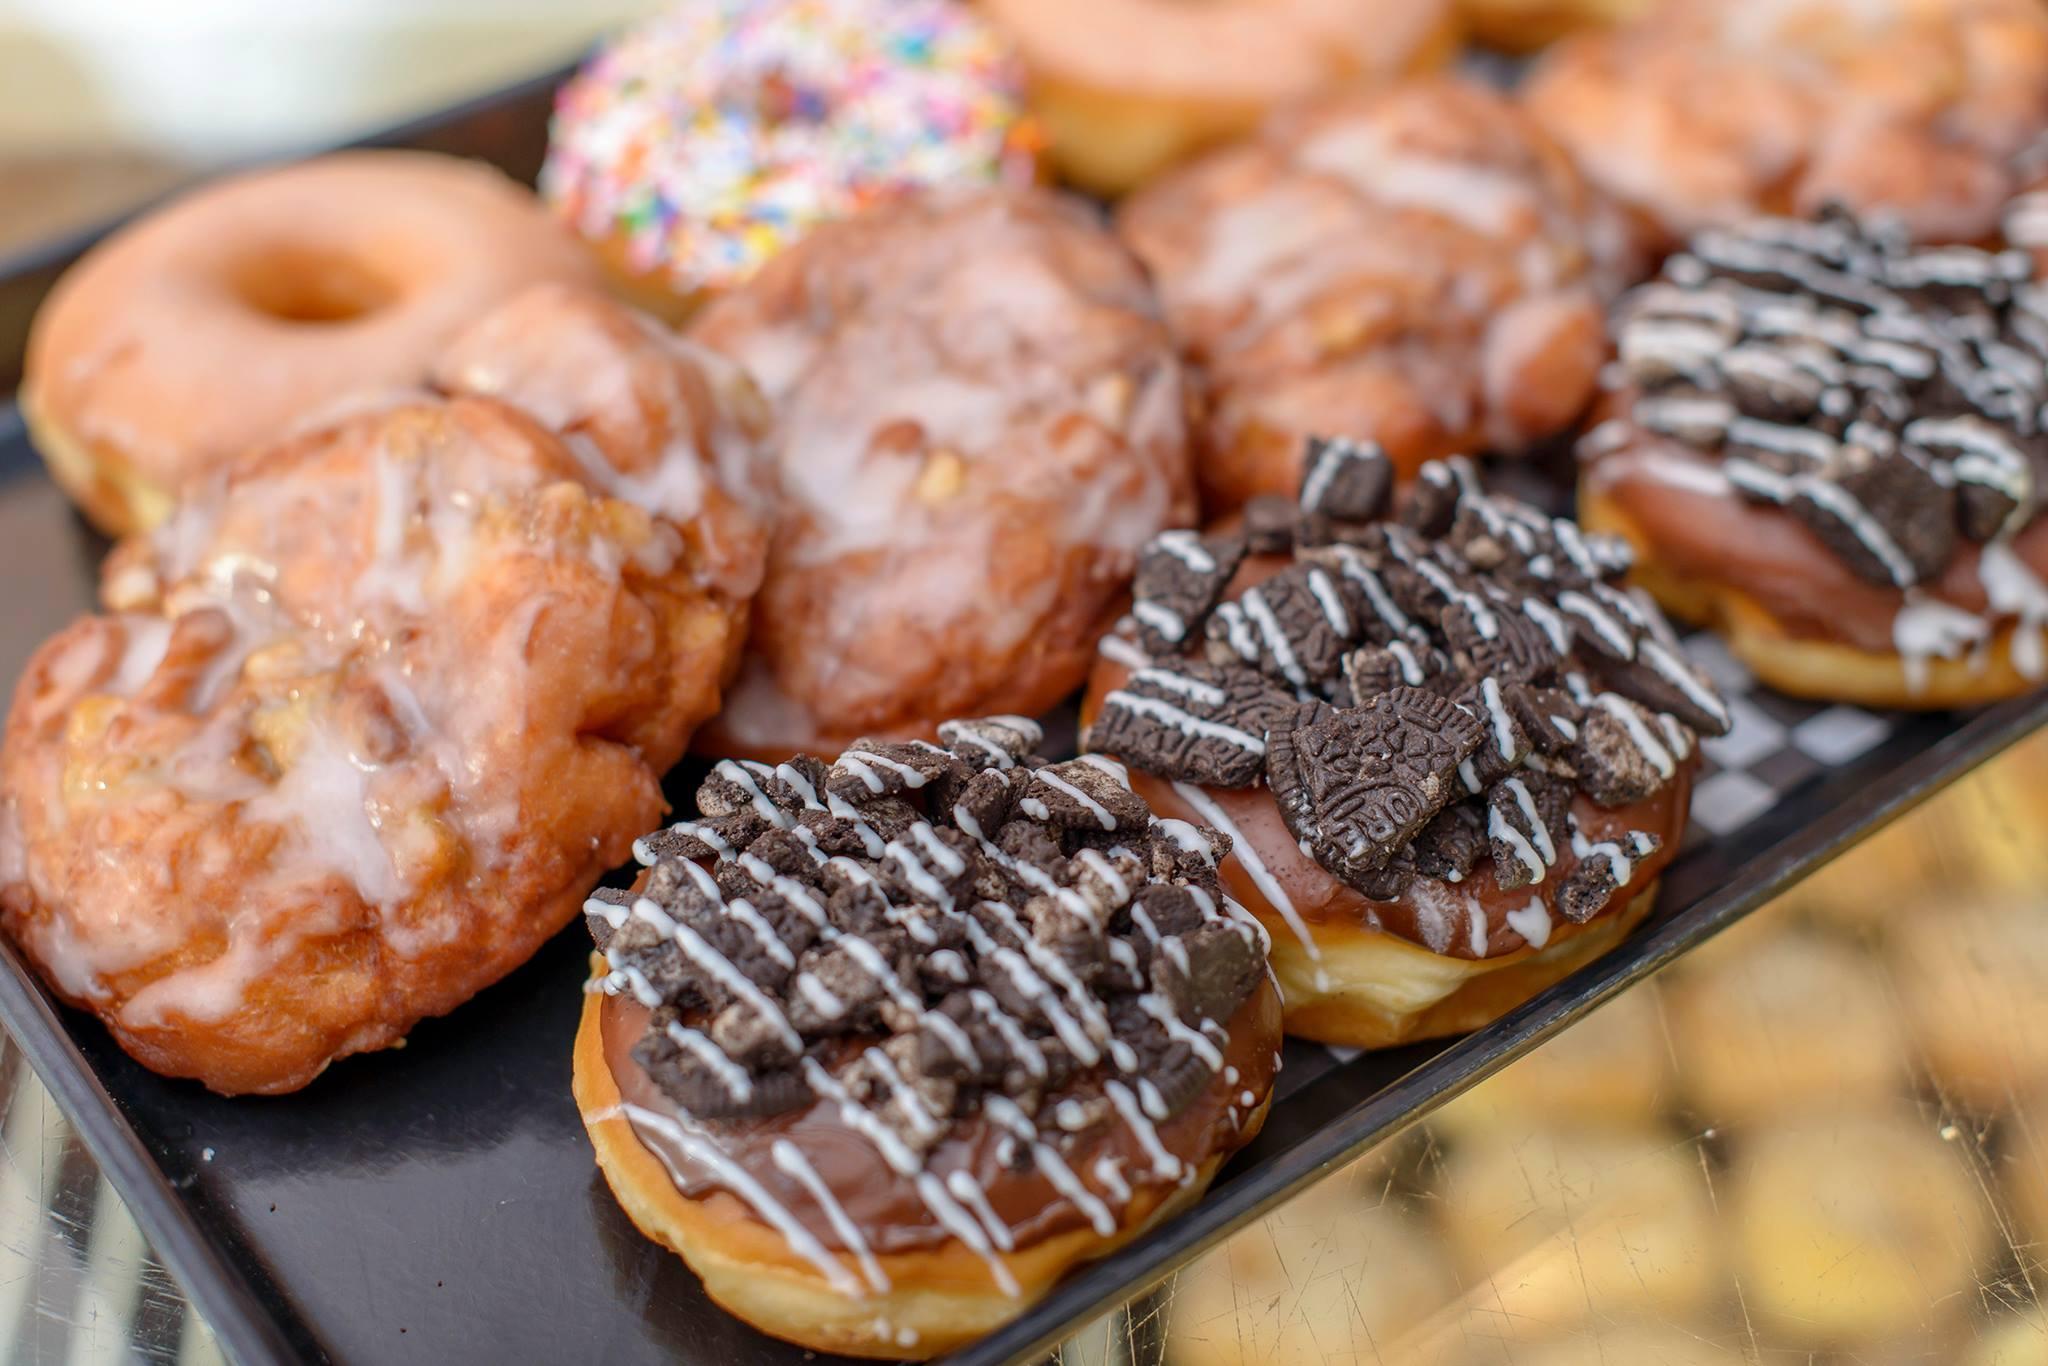 Cedarbrook bakery deli bistro experience langley